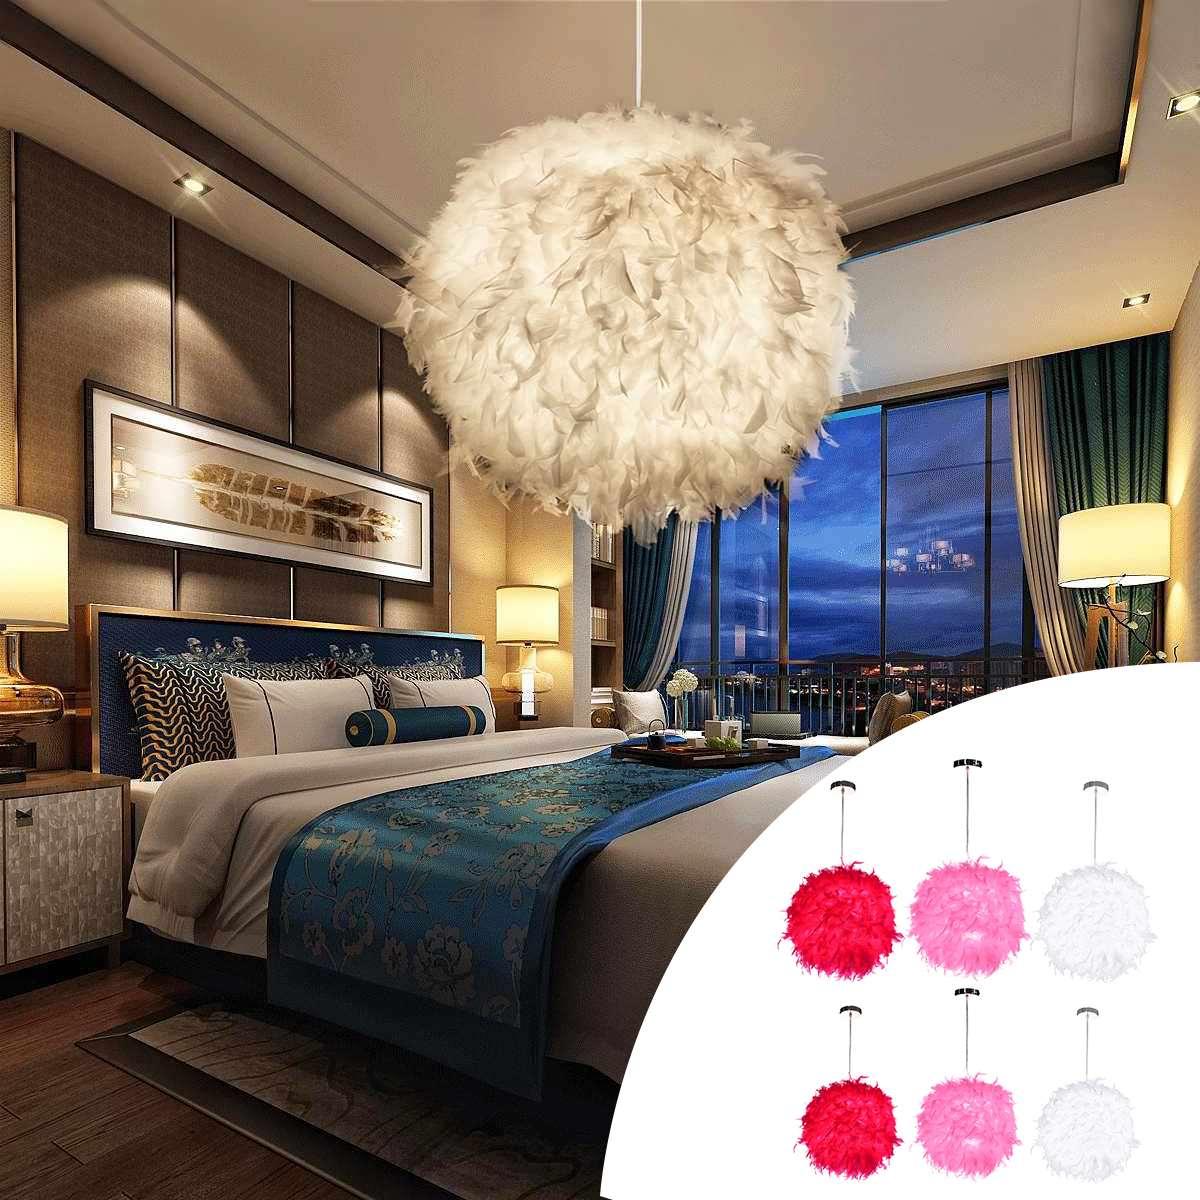 Red/Pink/White 110-220V E27 Modern Feather Ball Lamp Shade Ceiling Pendant Light Shade Bedroom Living Room Soft Safe Decor